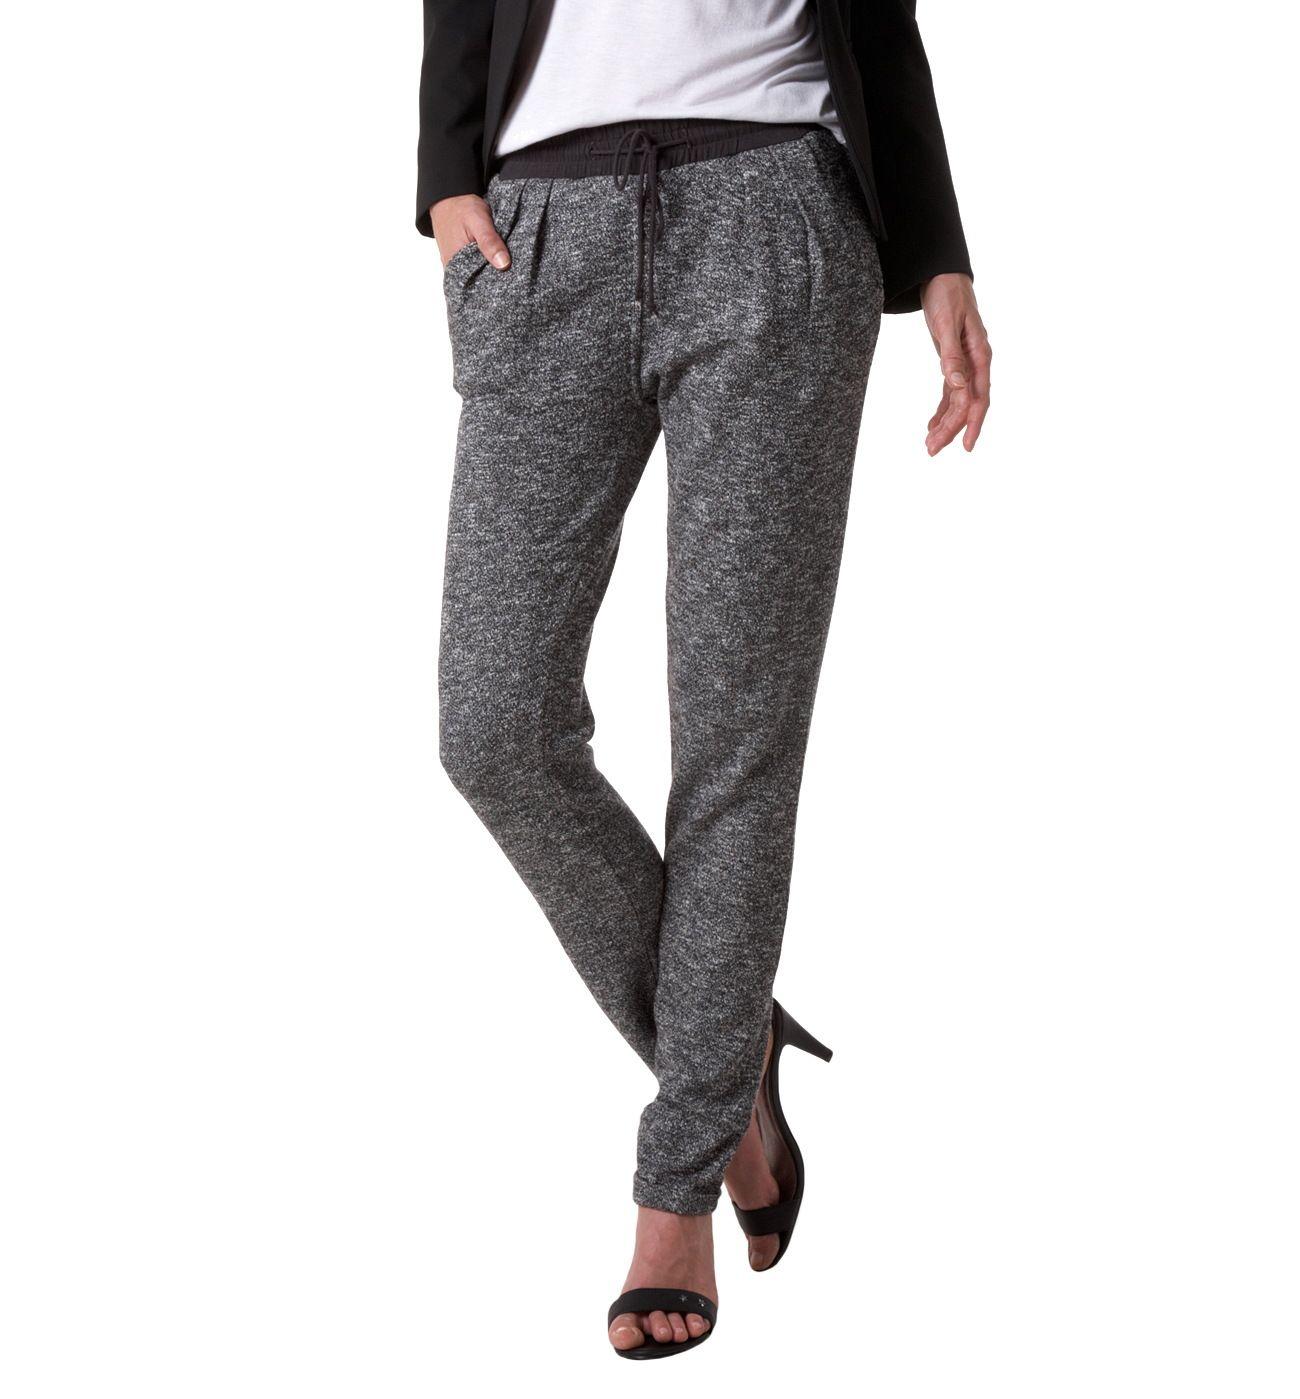 pantalon de jogging femme gris pantalons femme promod jogging pinterest pantalon. Black Bedroom Furniture Sets. Home Design Ideas